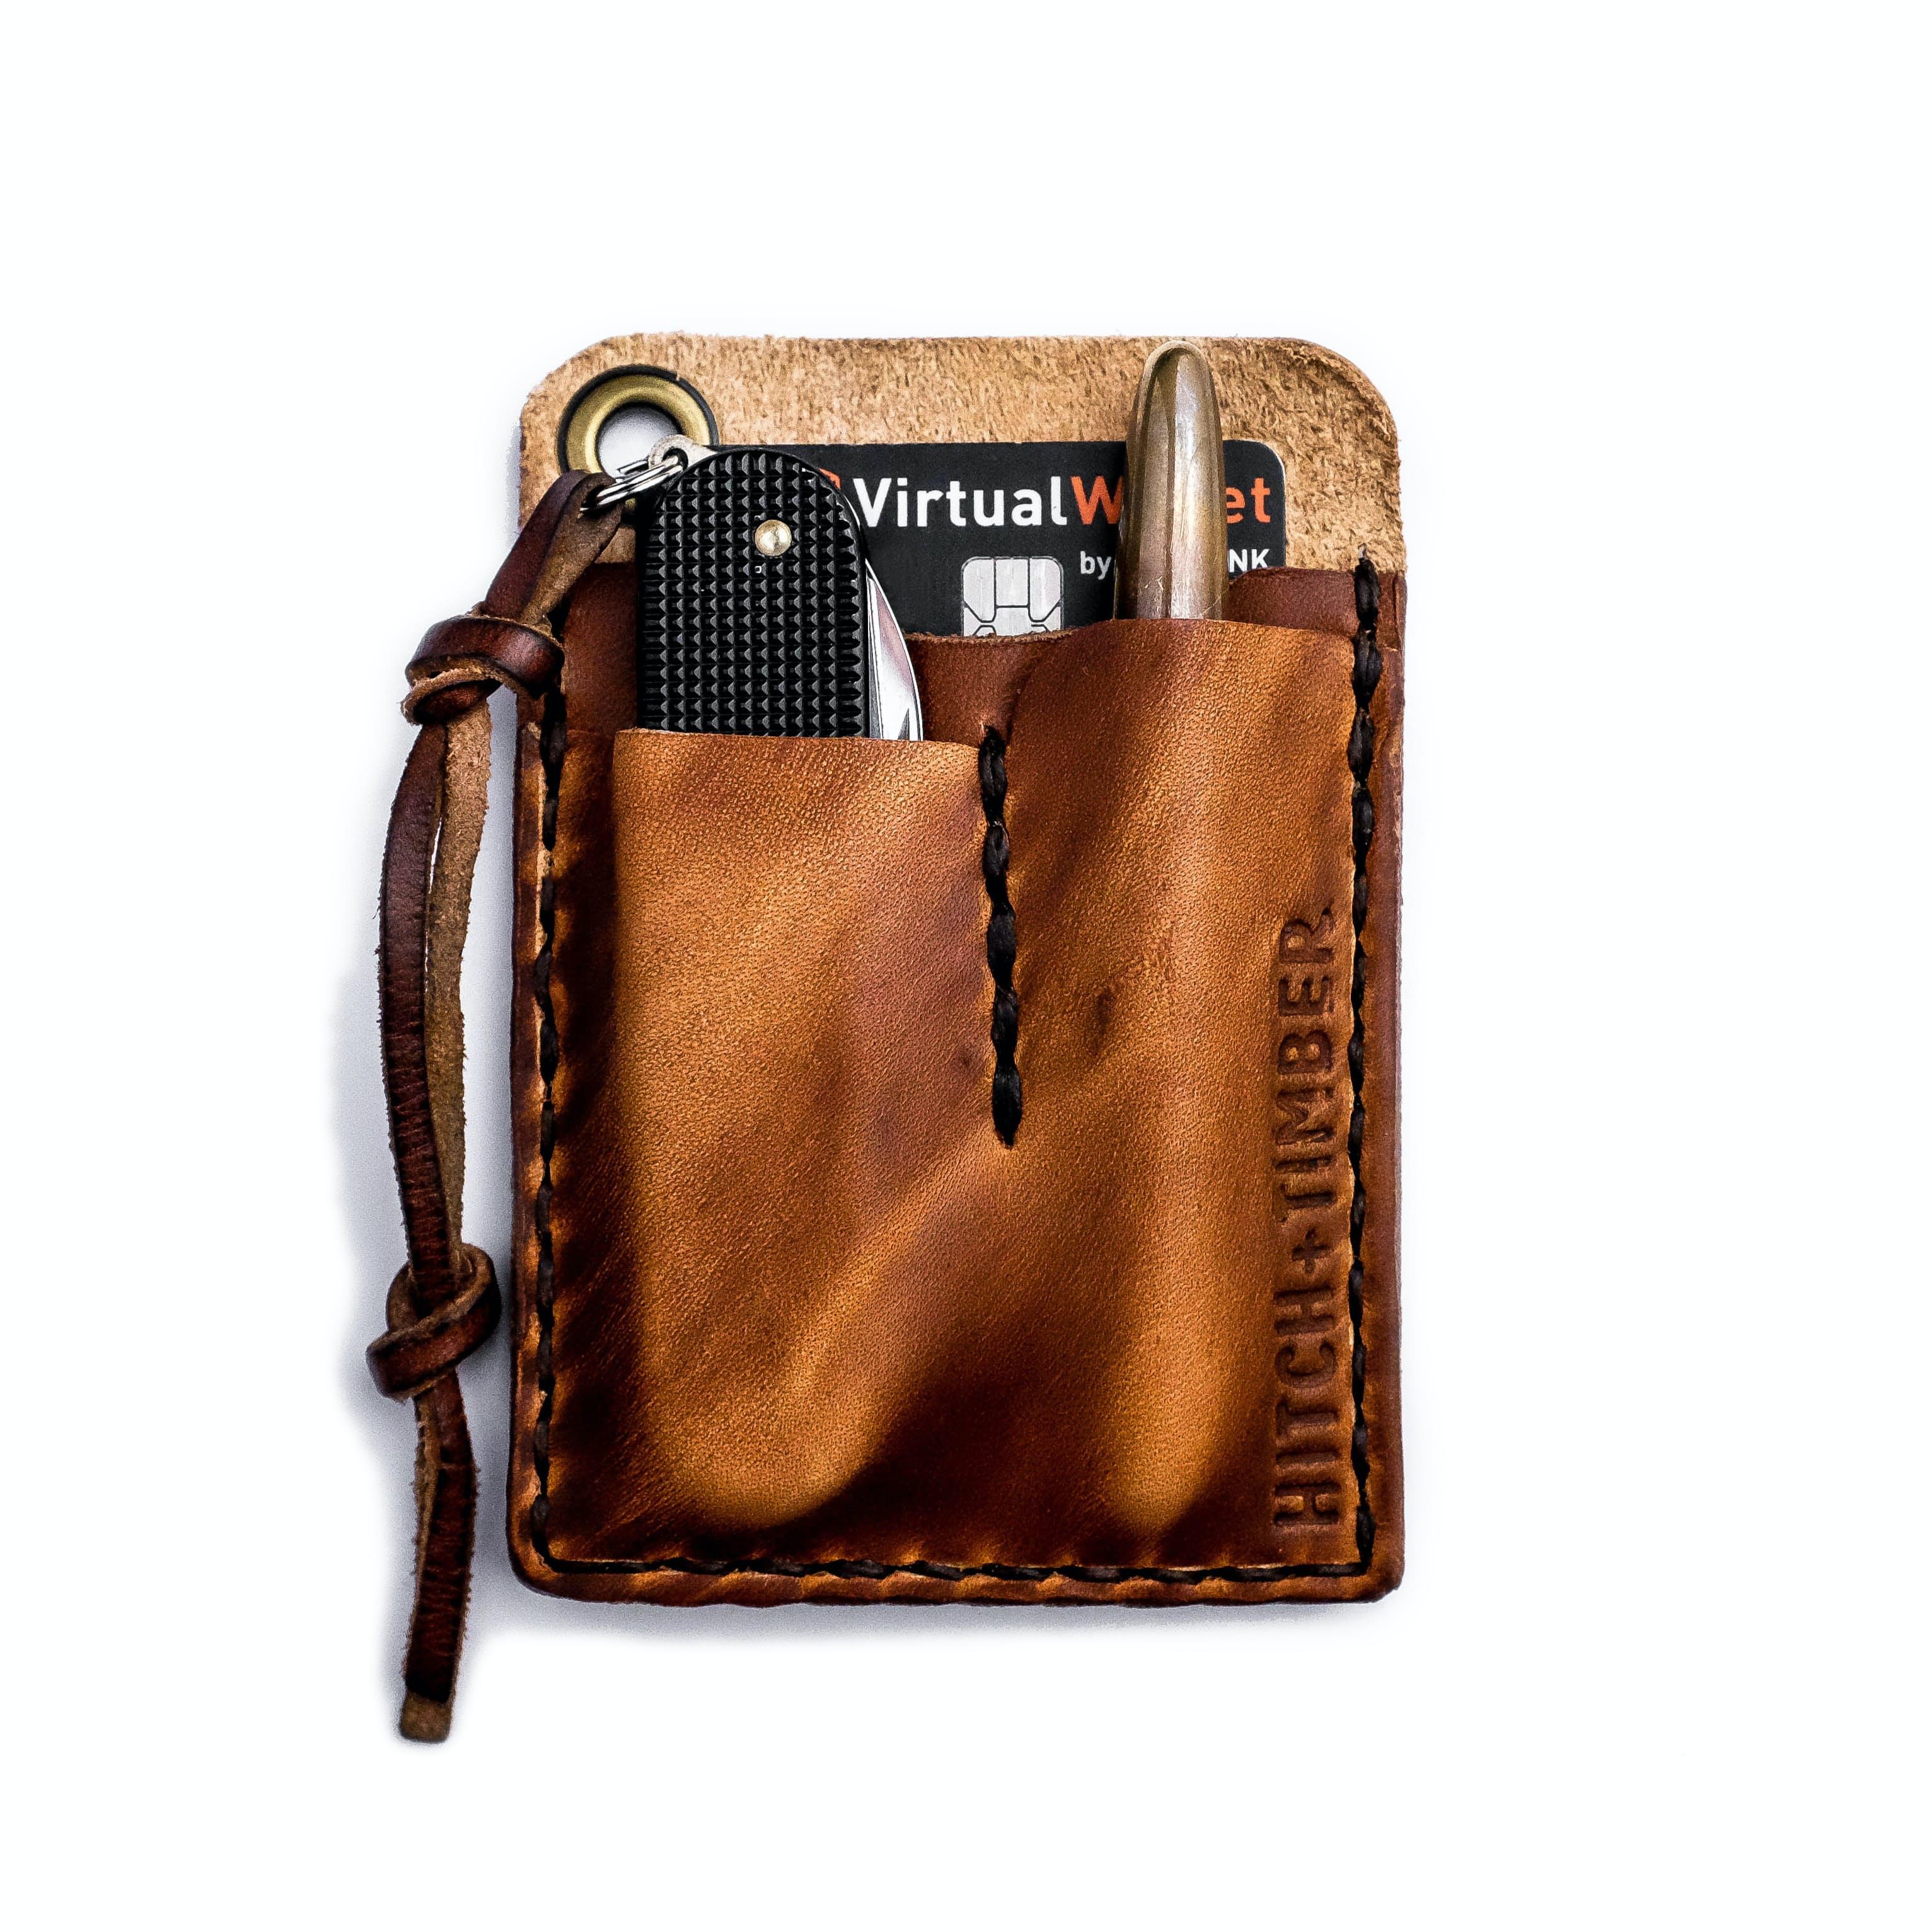 Iuydx2b4cd hitch timber card caddy wallet 0 original